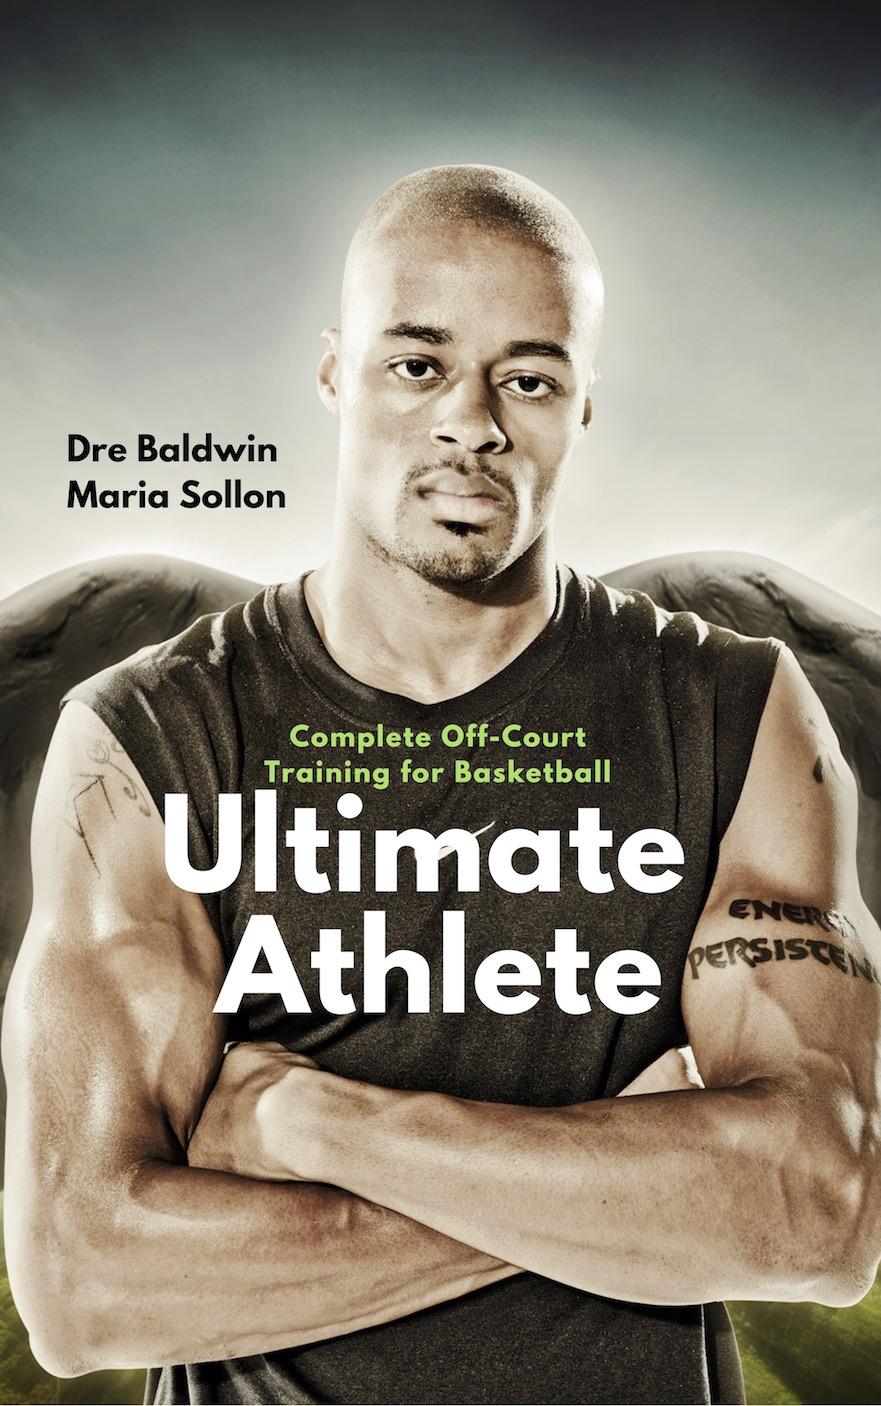 Ultimate Athlete by Dre Baldwin & Maria Sollon